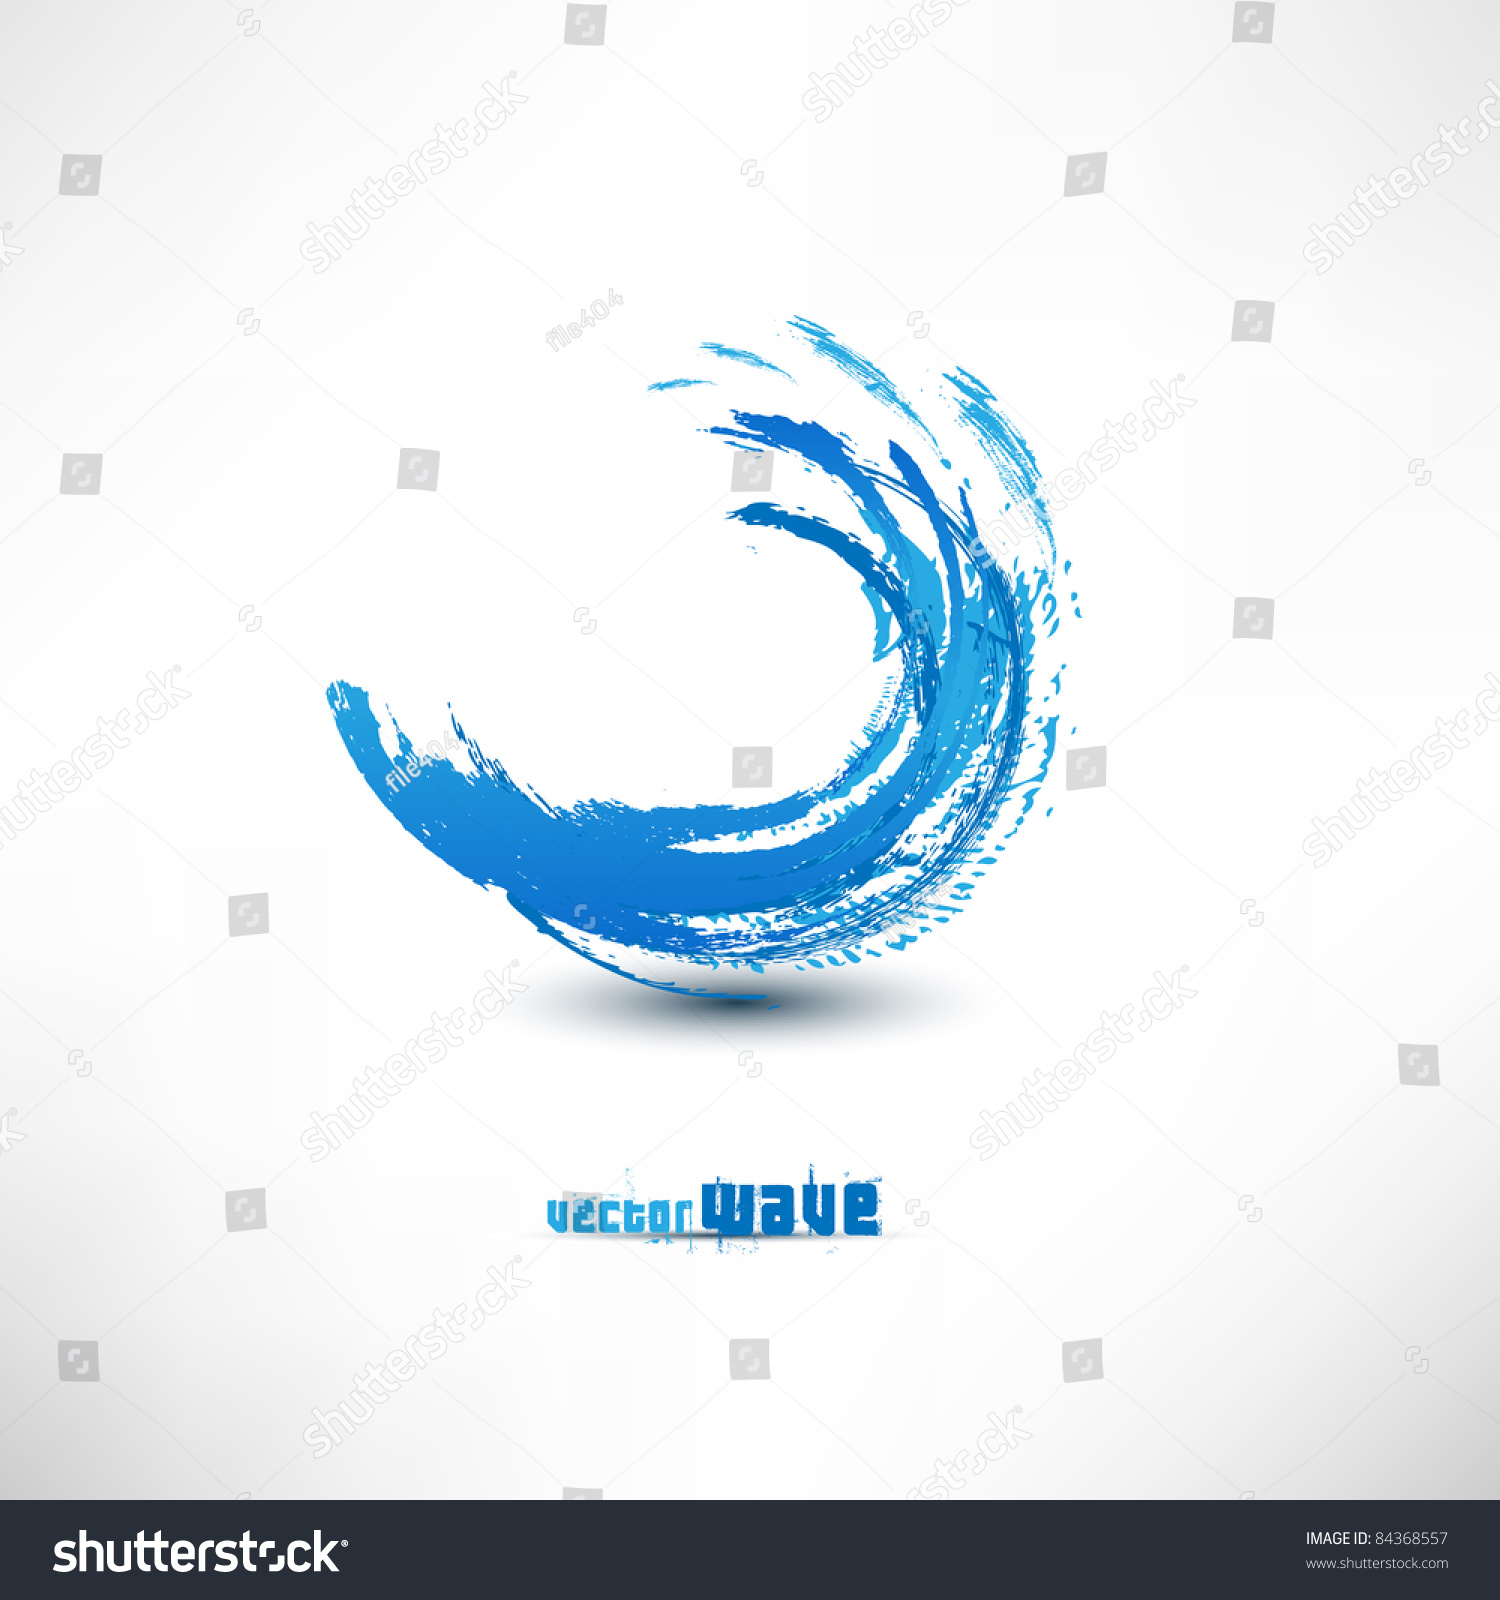 Blue Wave Sign Stock Vector Illustration 84368557 : Shutterstock